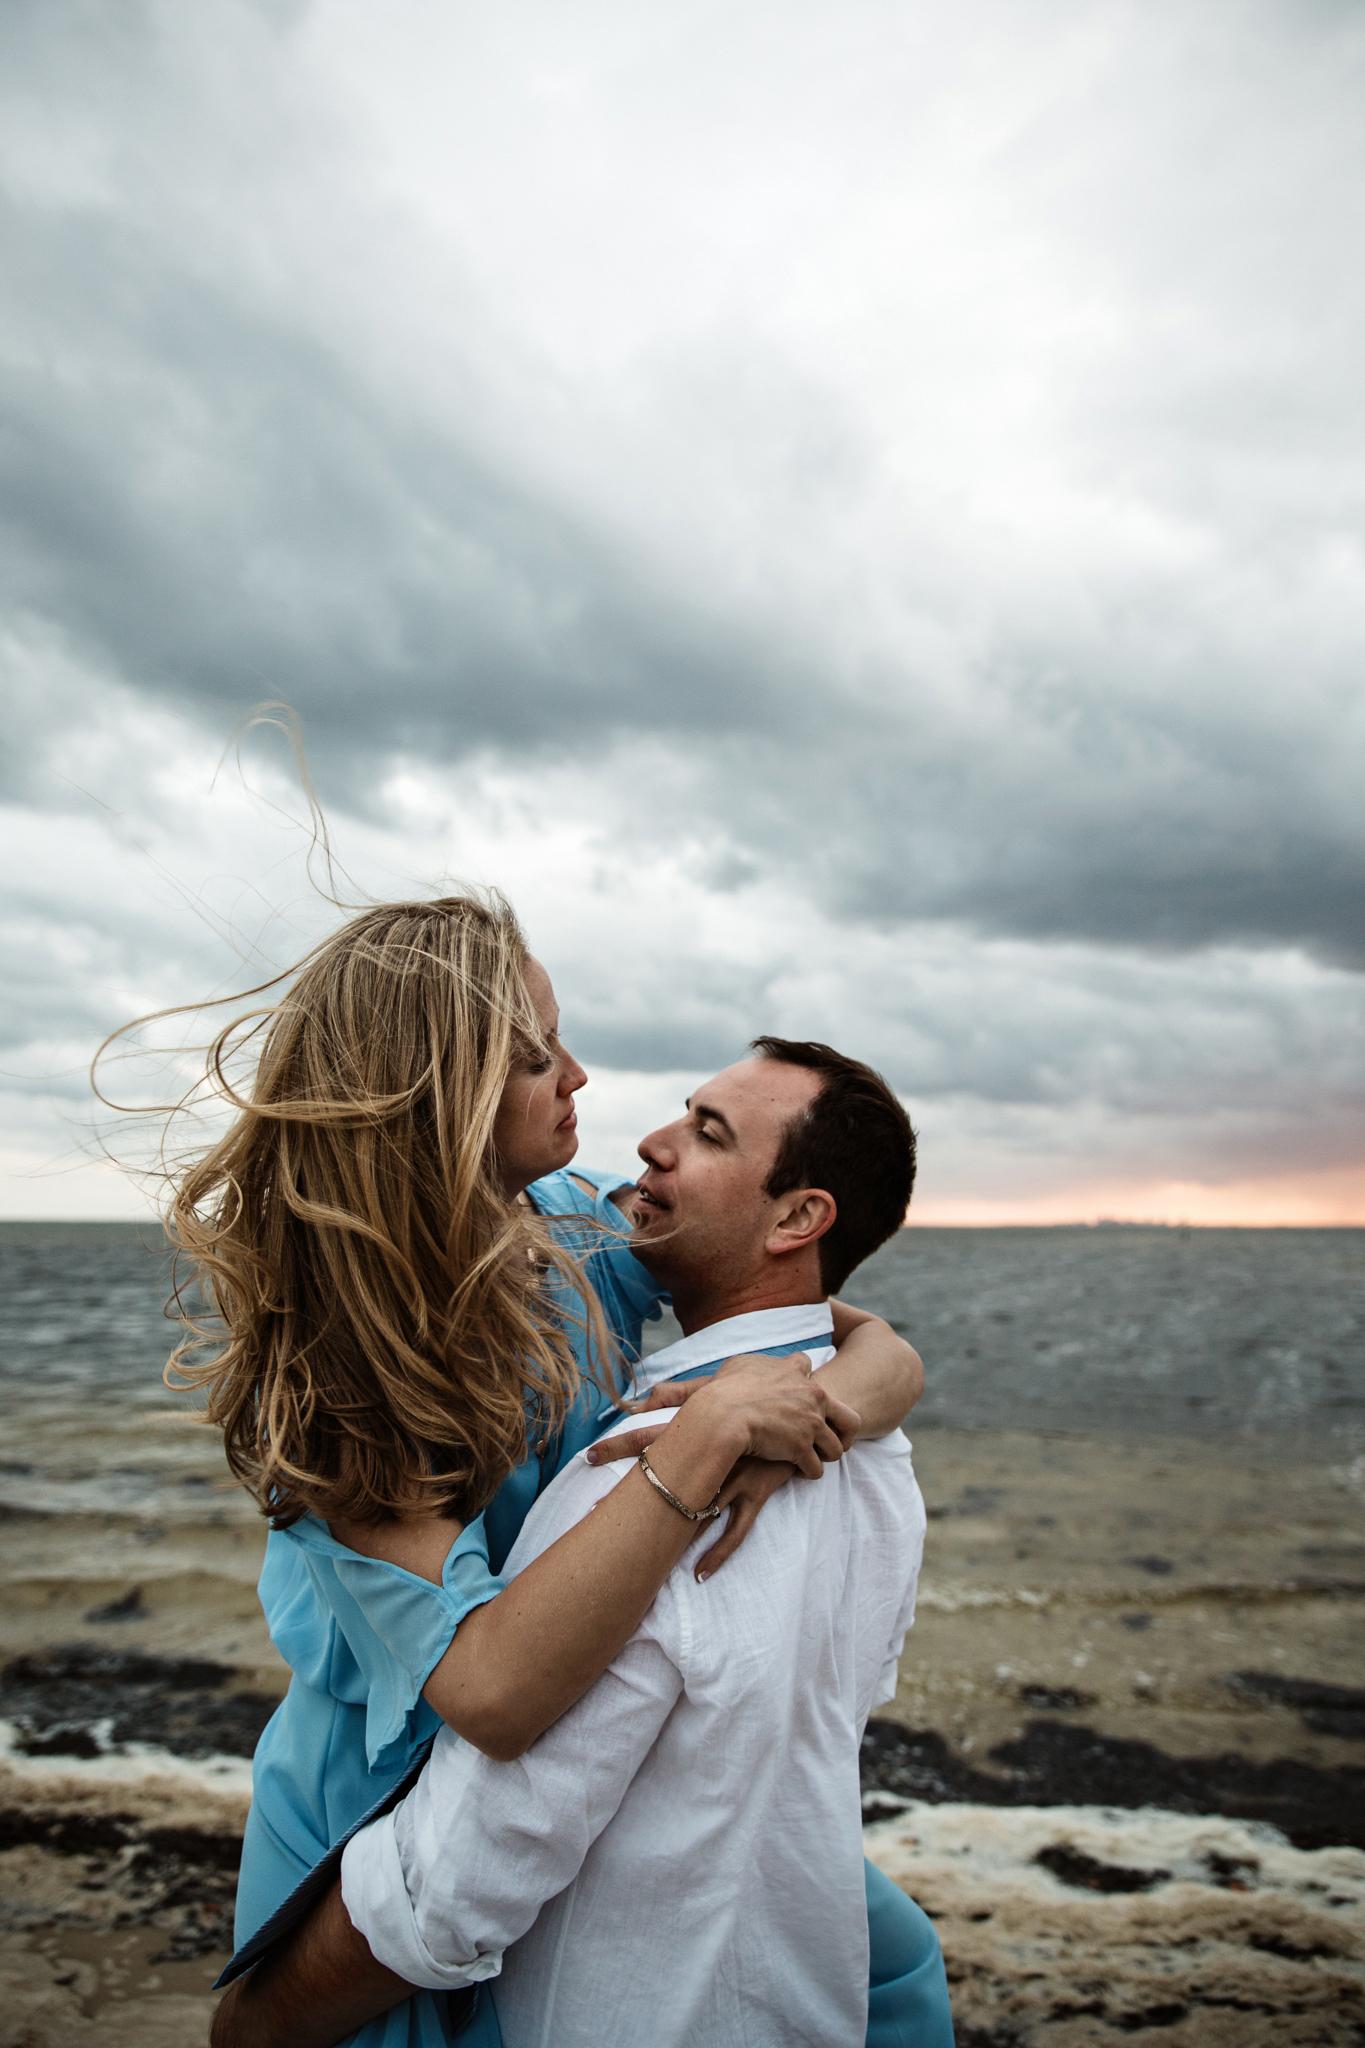 Jonathan&BrittanyEngagementSOCIALMEDIA-45.jpg